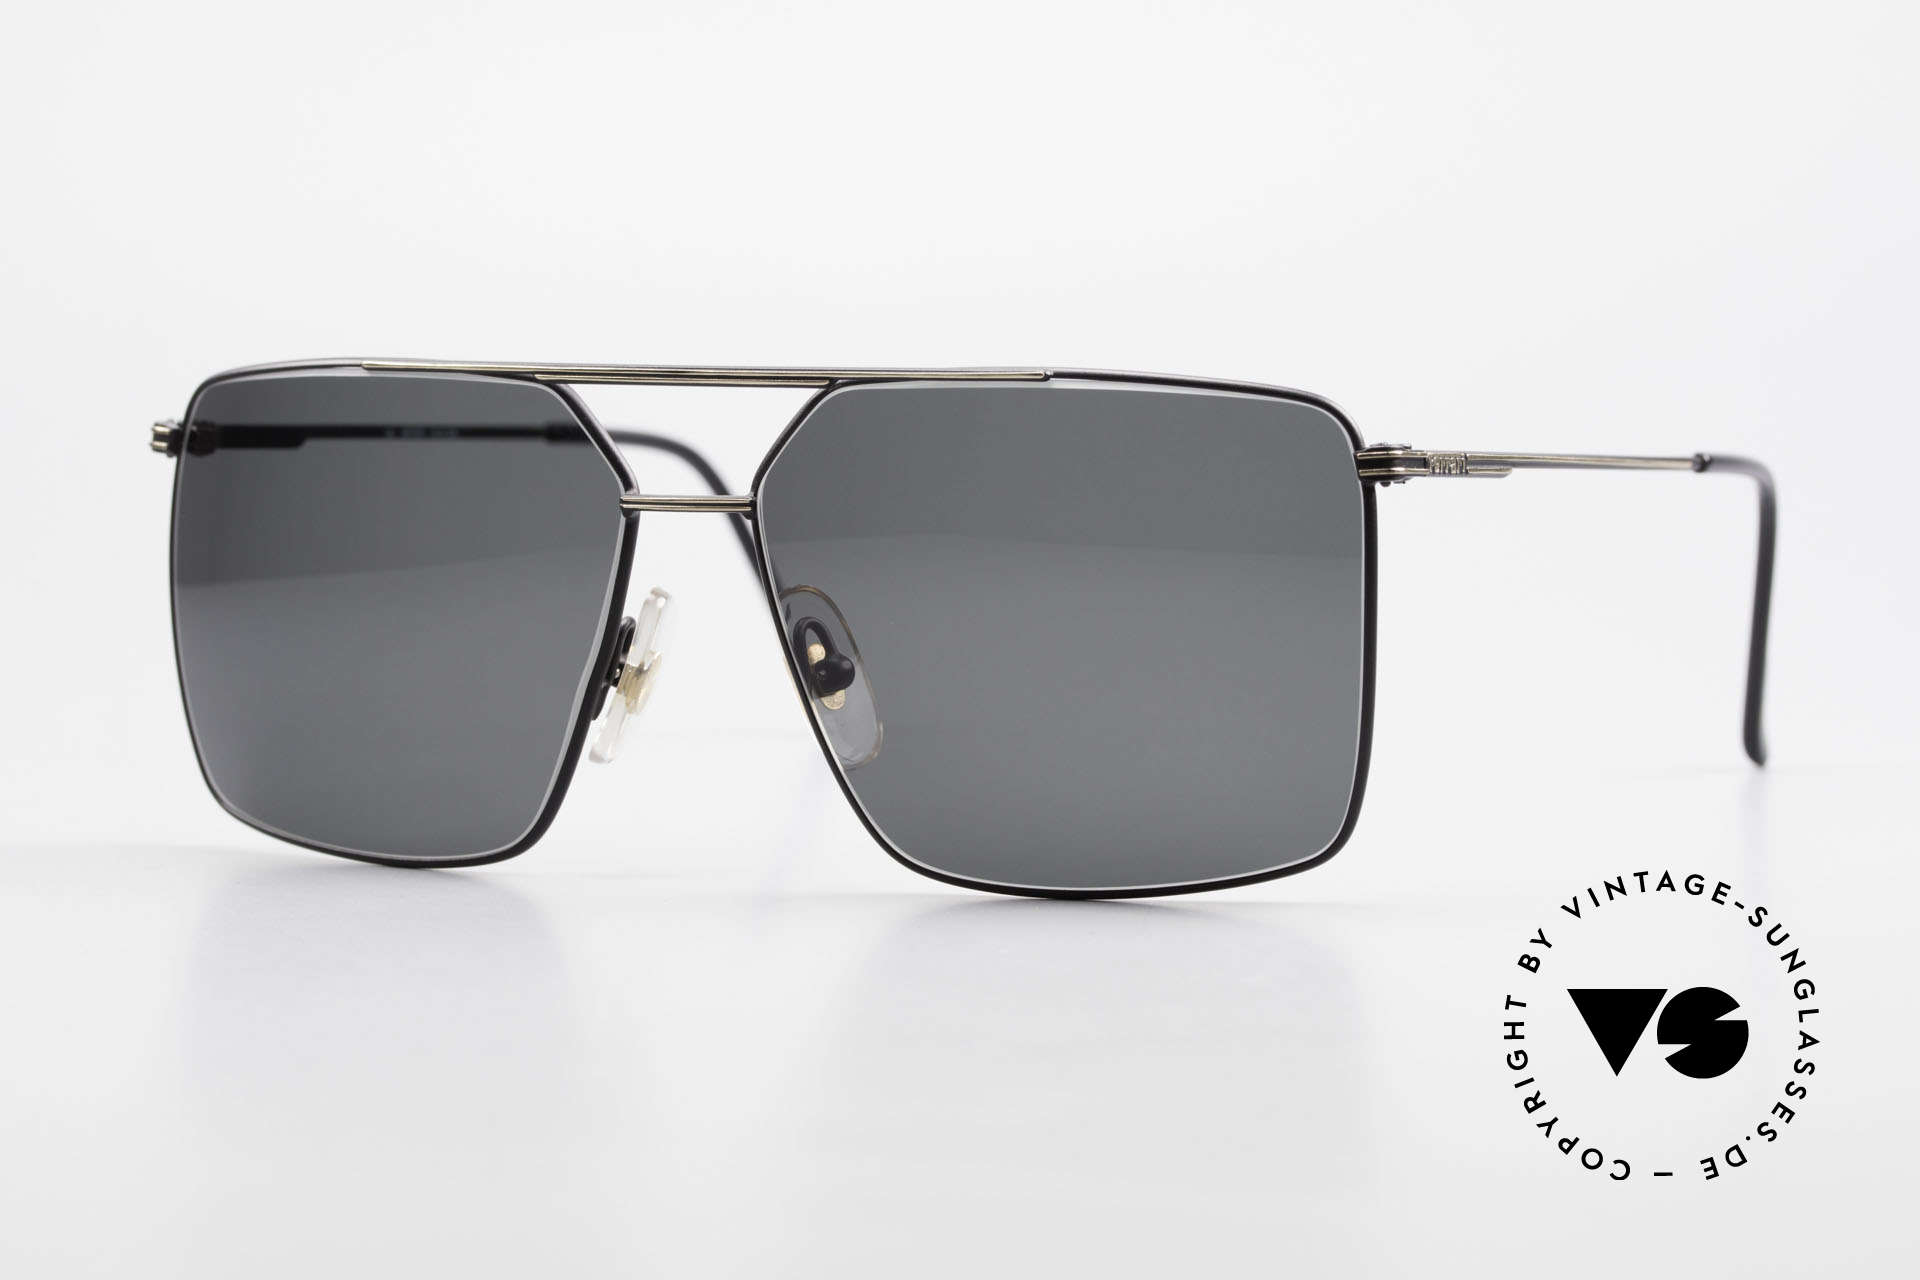 Ferrari F46 Retro Sunglasses Old Vintage, striking model of the FERRARI 'Formula 1' series, Made for Men